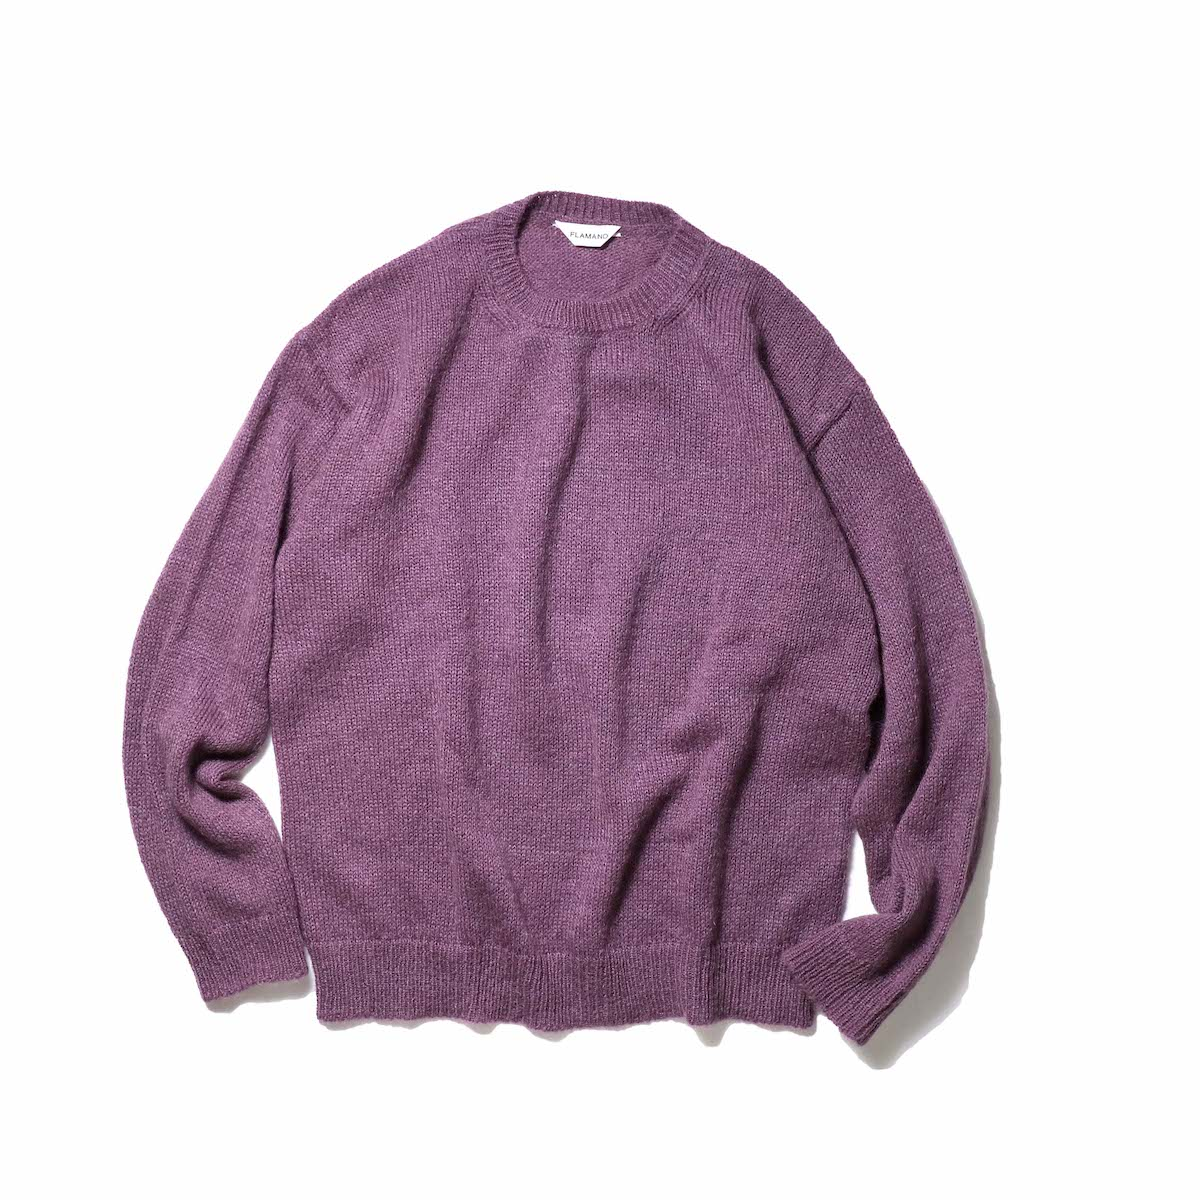 FLAMAND / Mohair Basic (Dark Lavender)